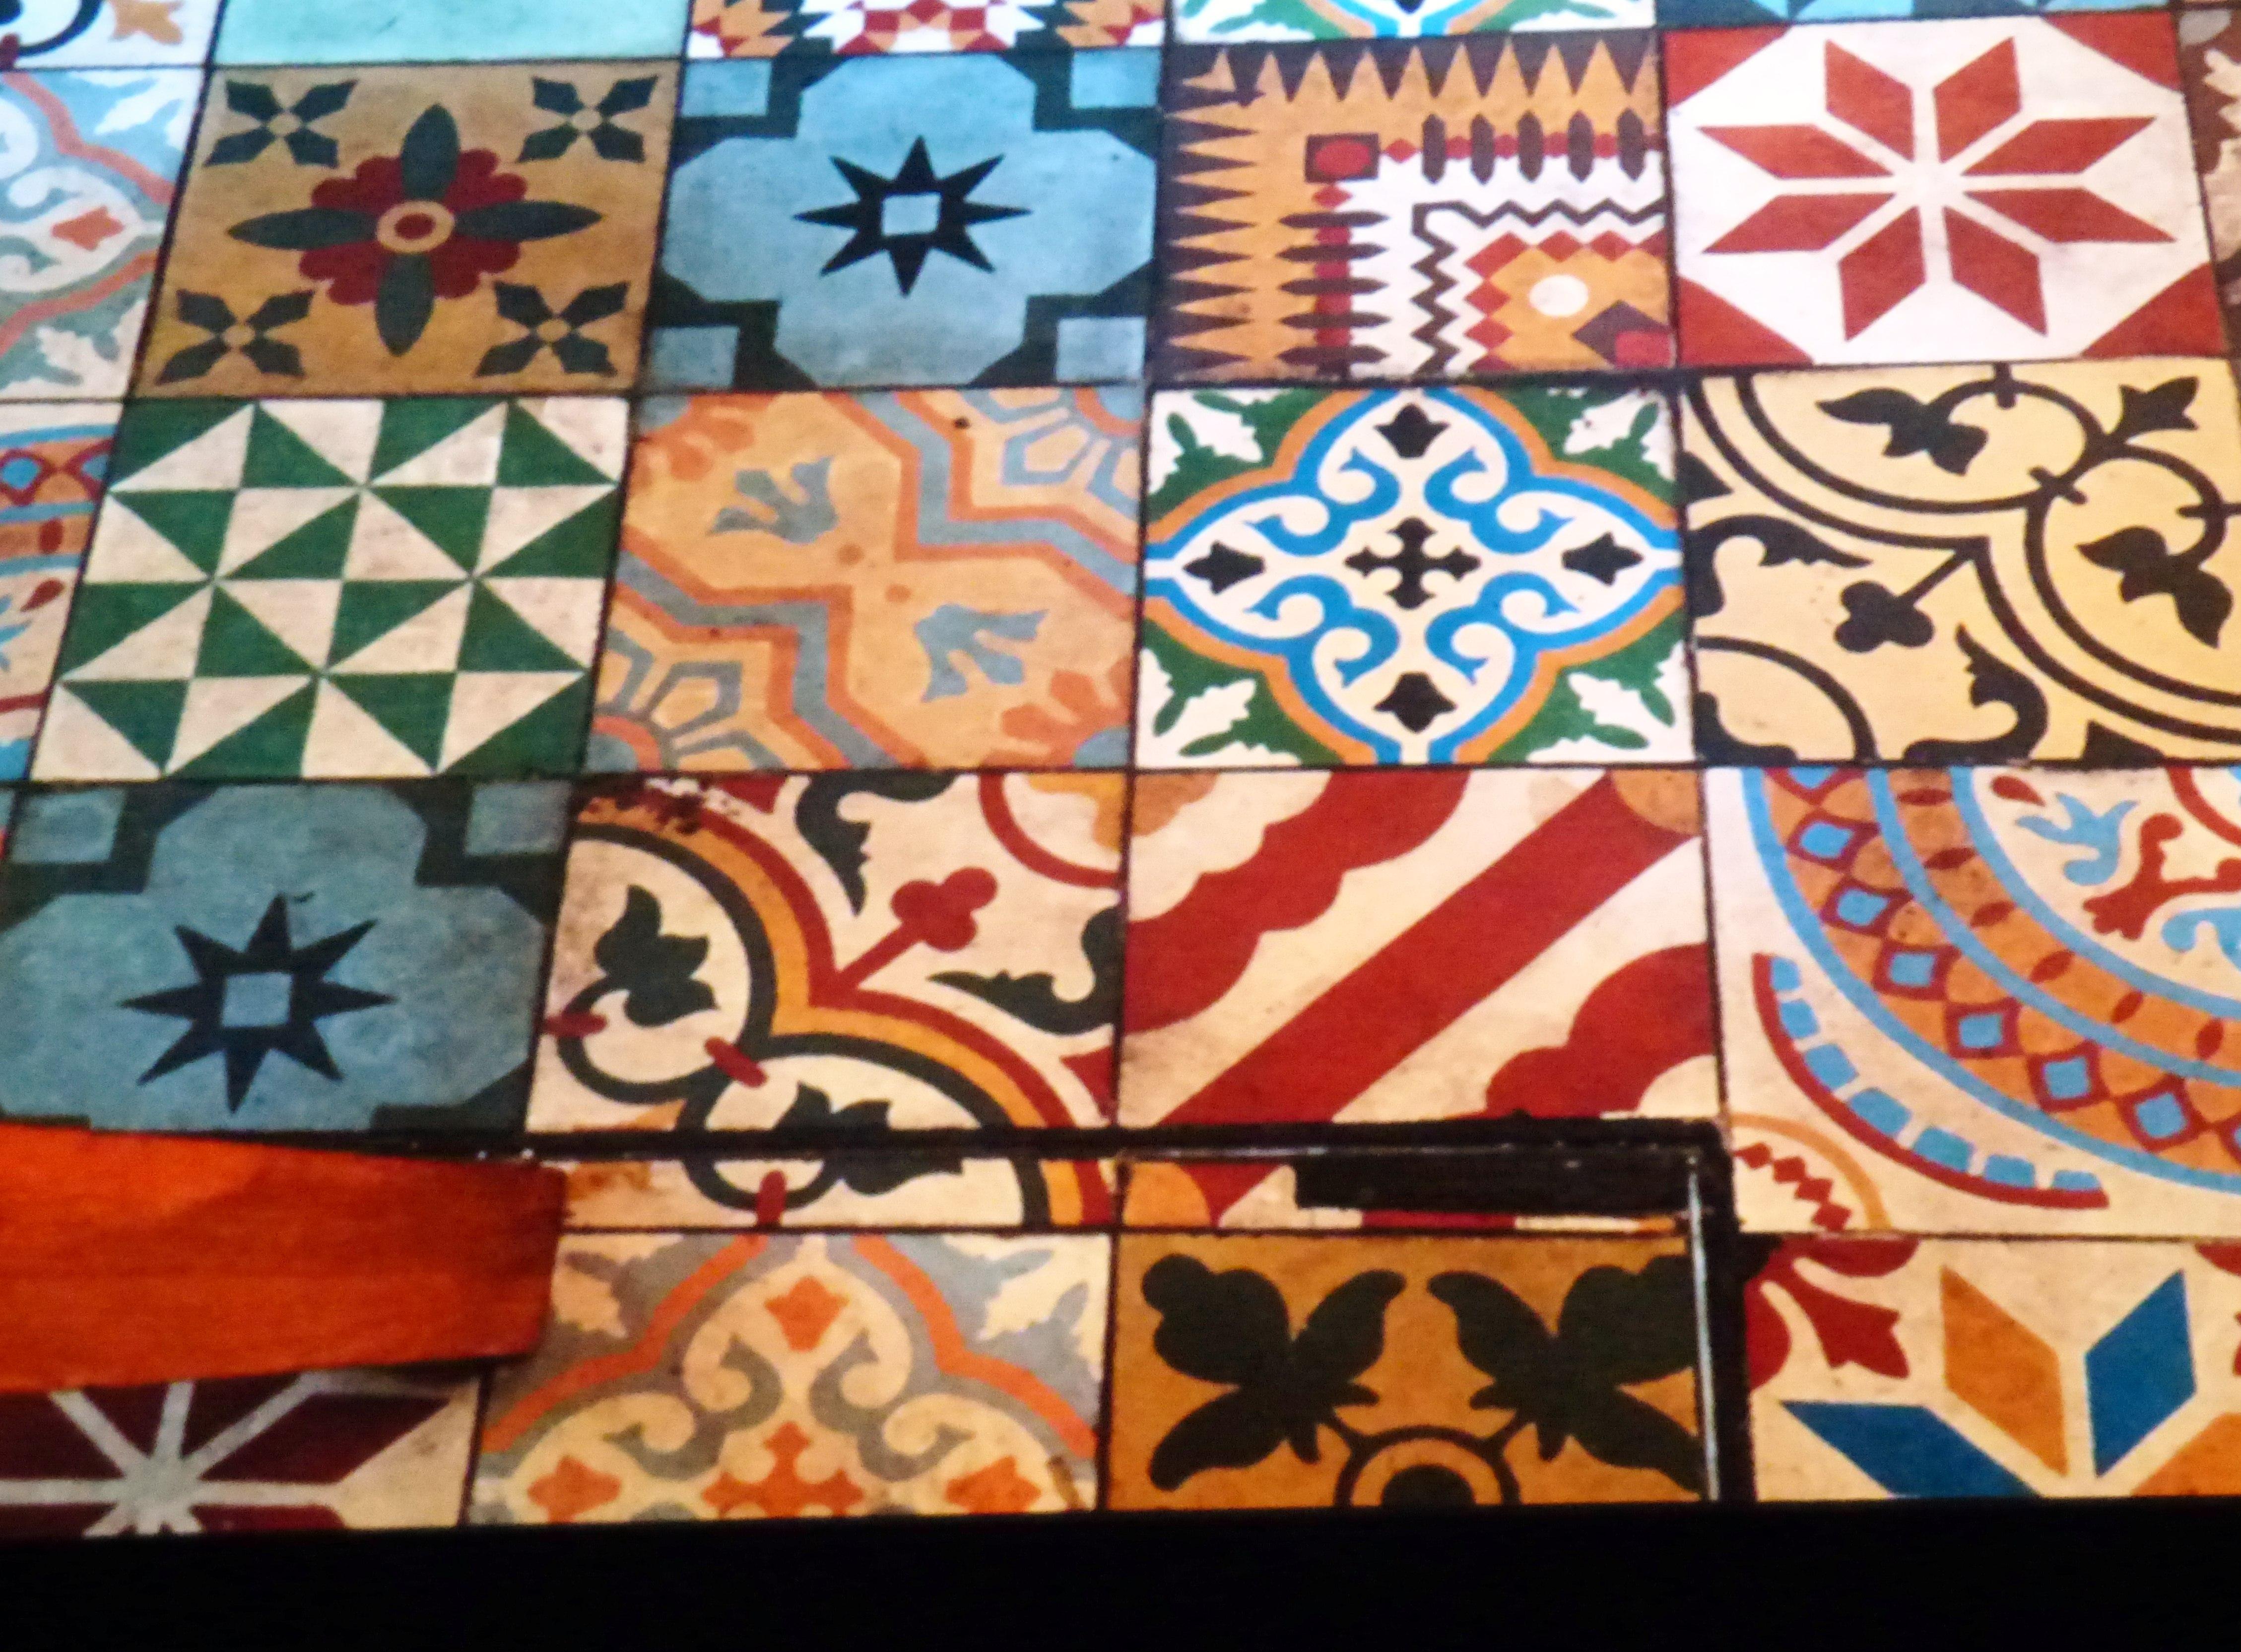 inspiration slide showing tiled floor at Kaffe Fassett Lecture, Capstone Theatre, Dec 2016